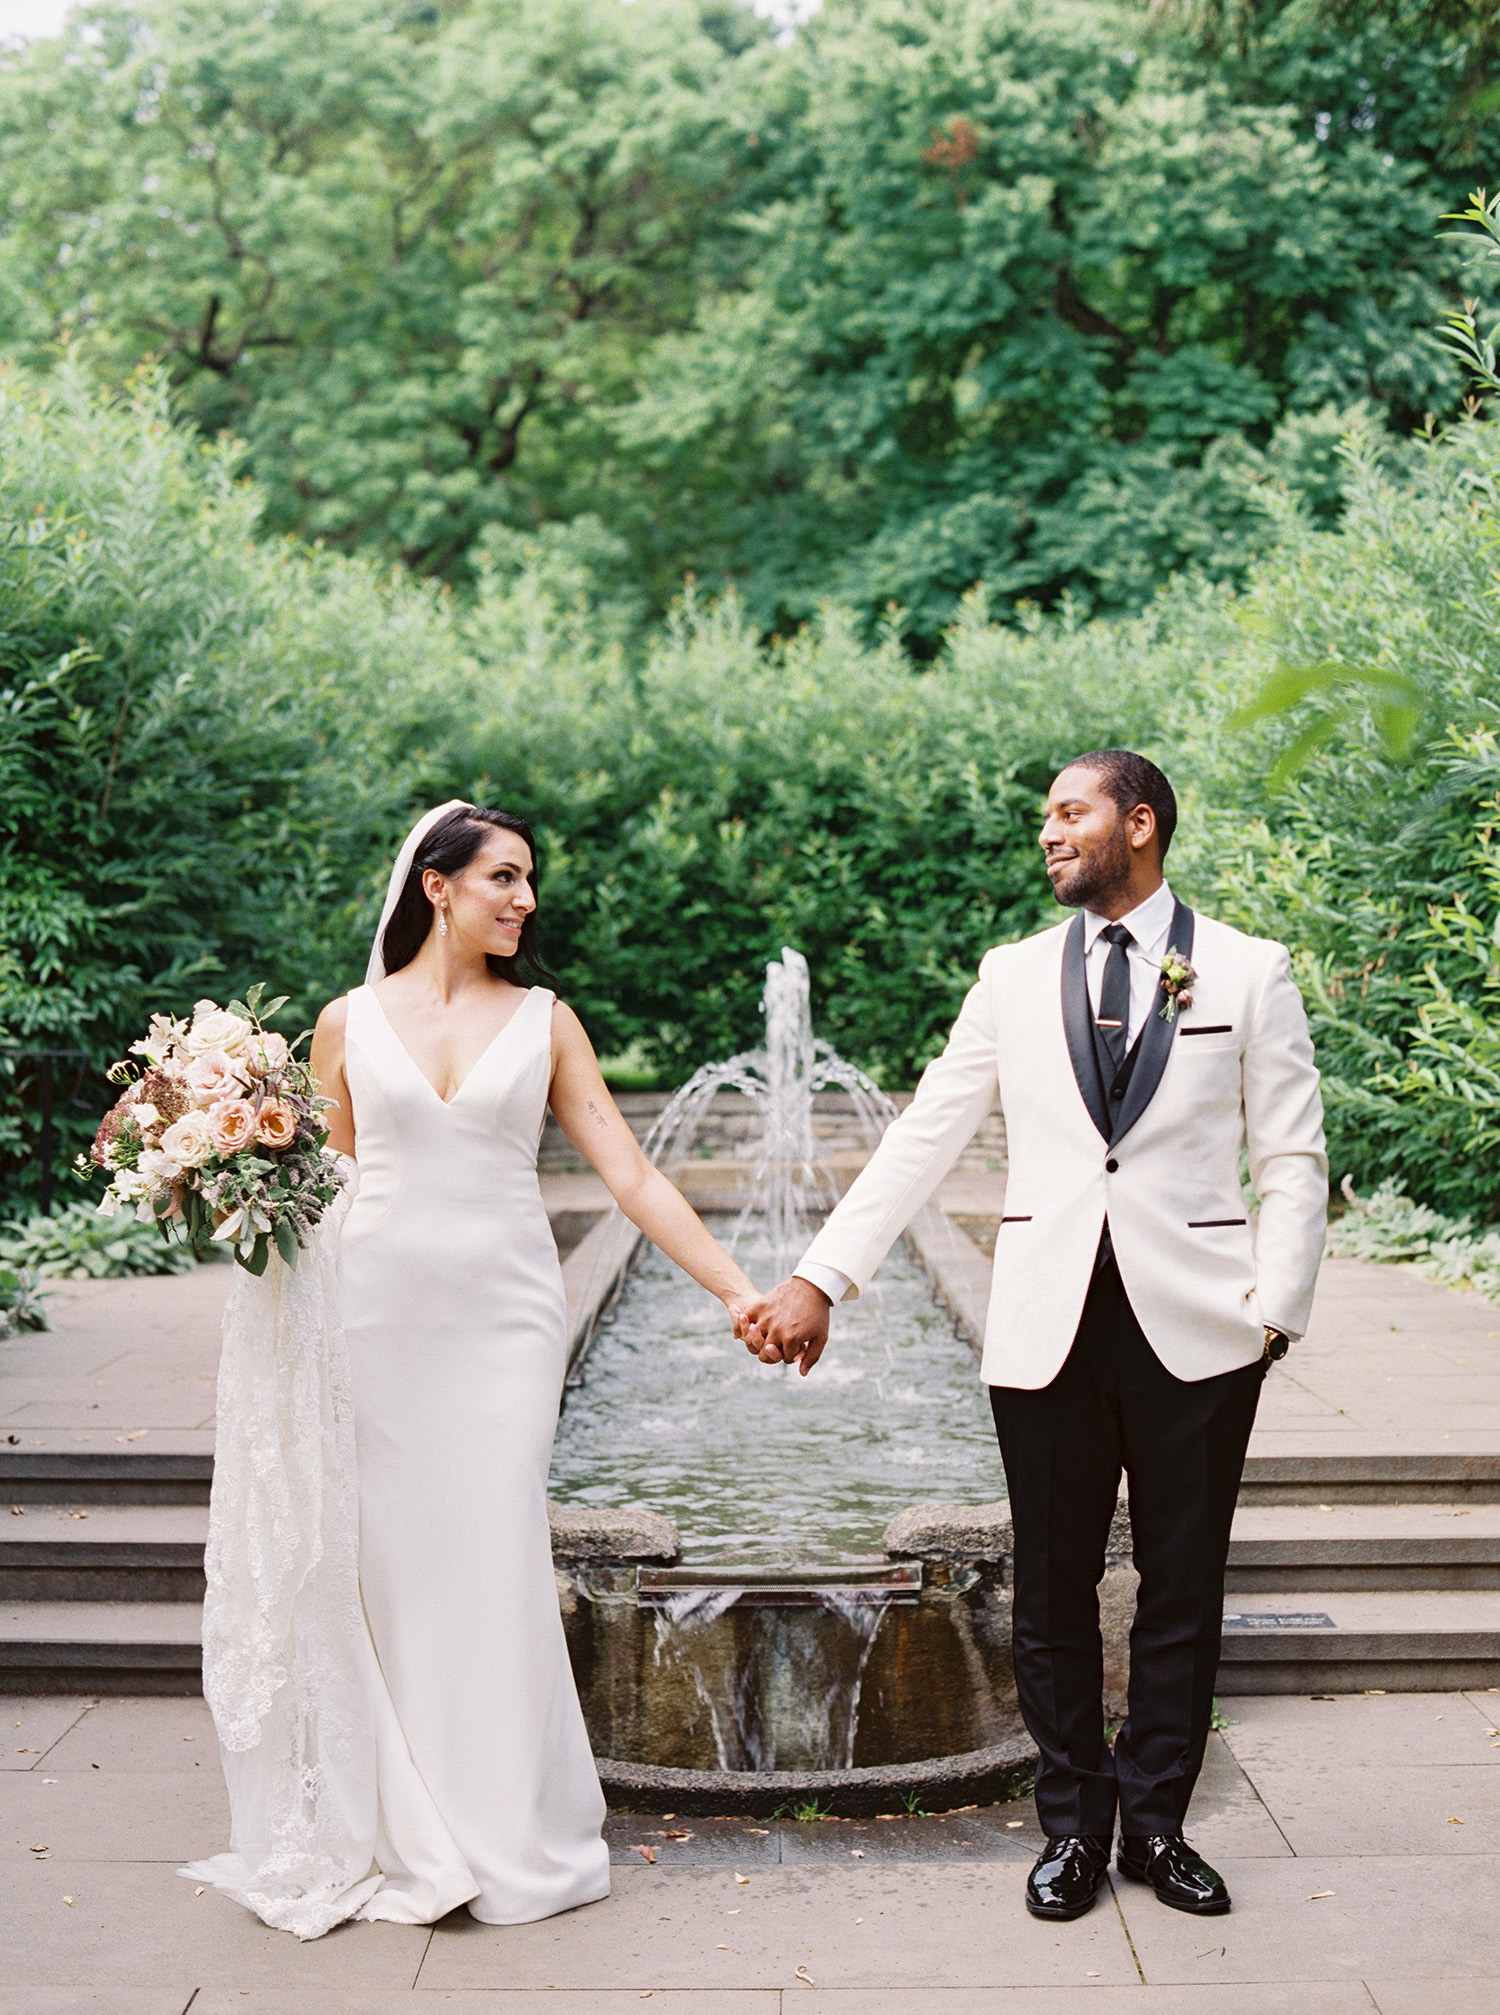 This Philadelphia Garden Wedding Was Full Of Emotional Family